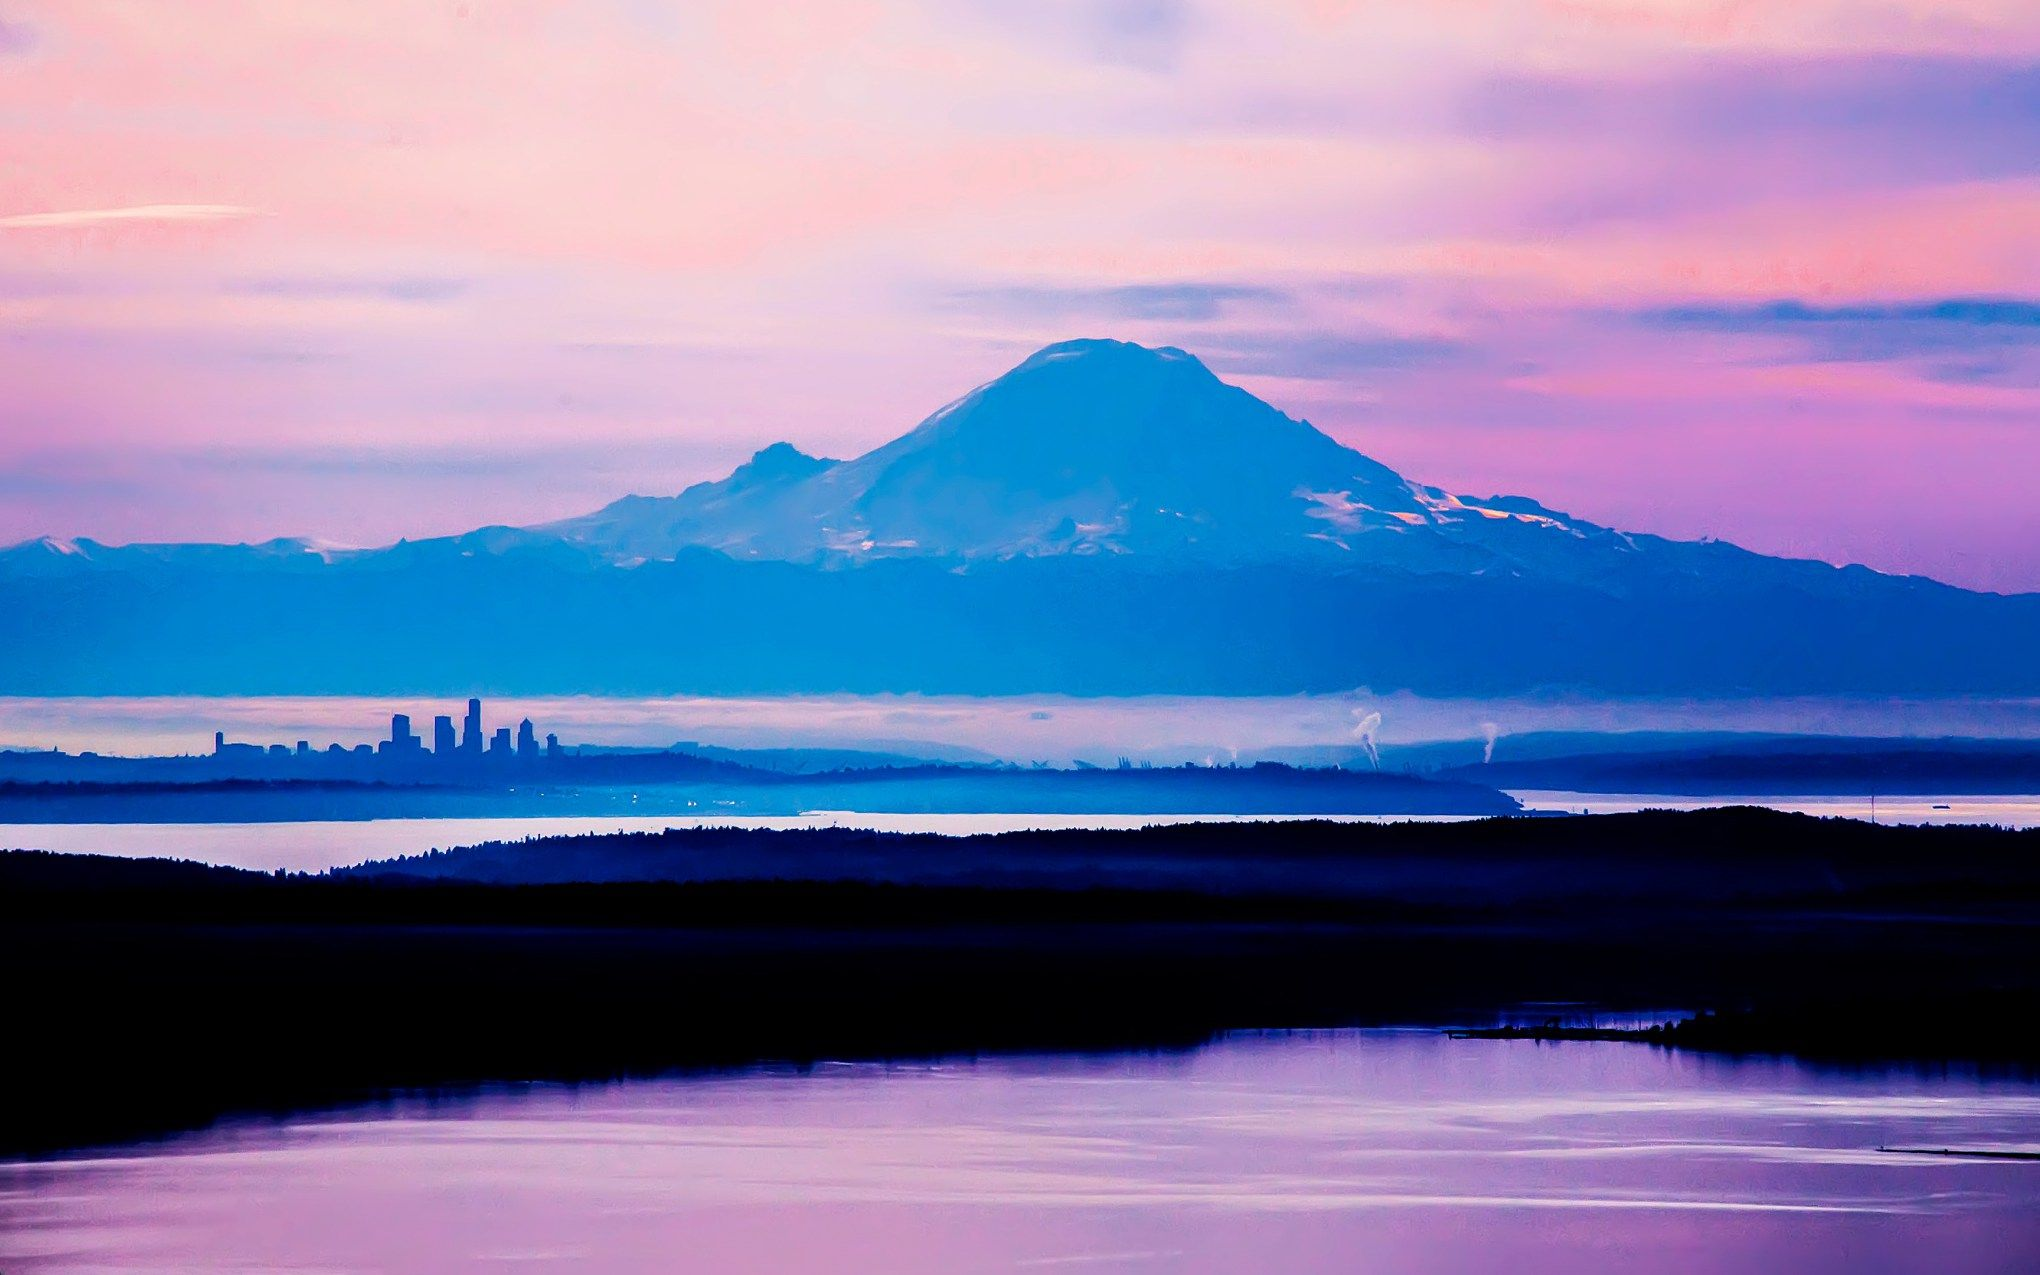 Landscape Background Image for Photo Editing Landscape